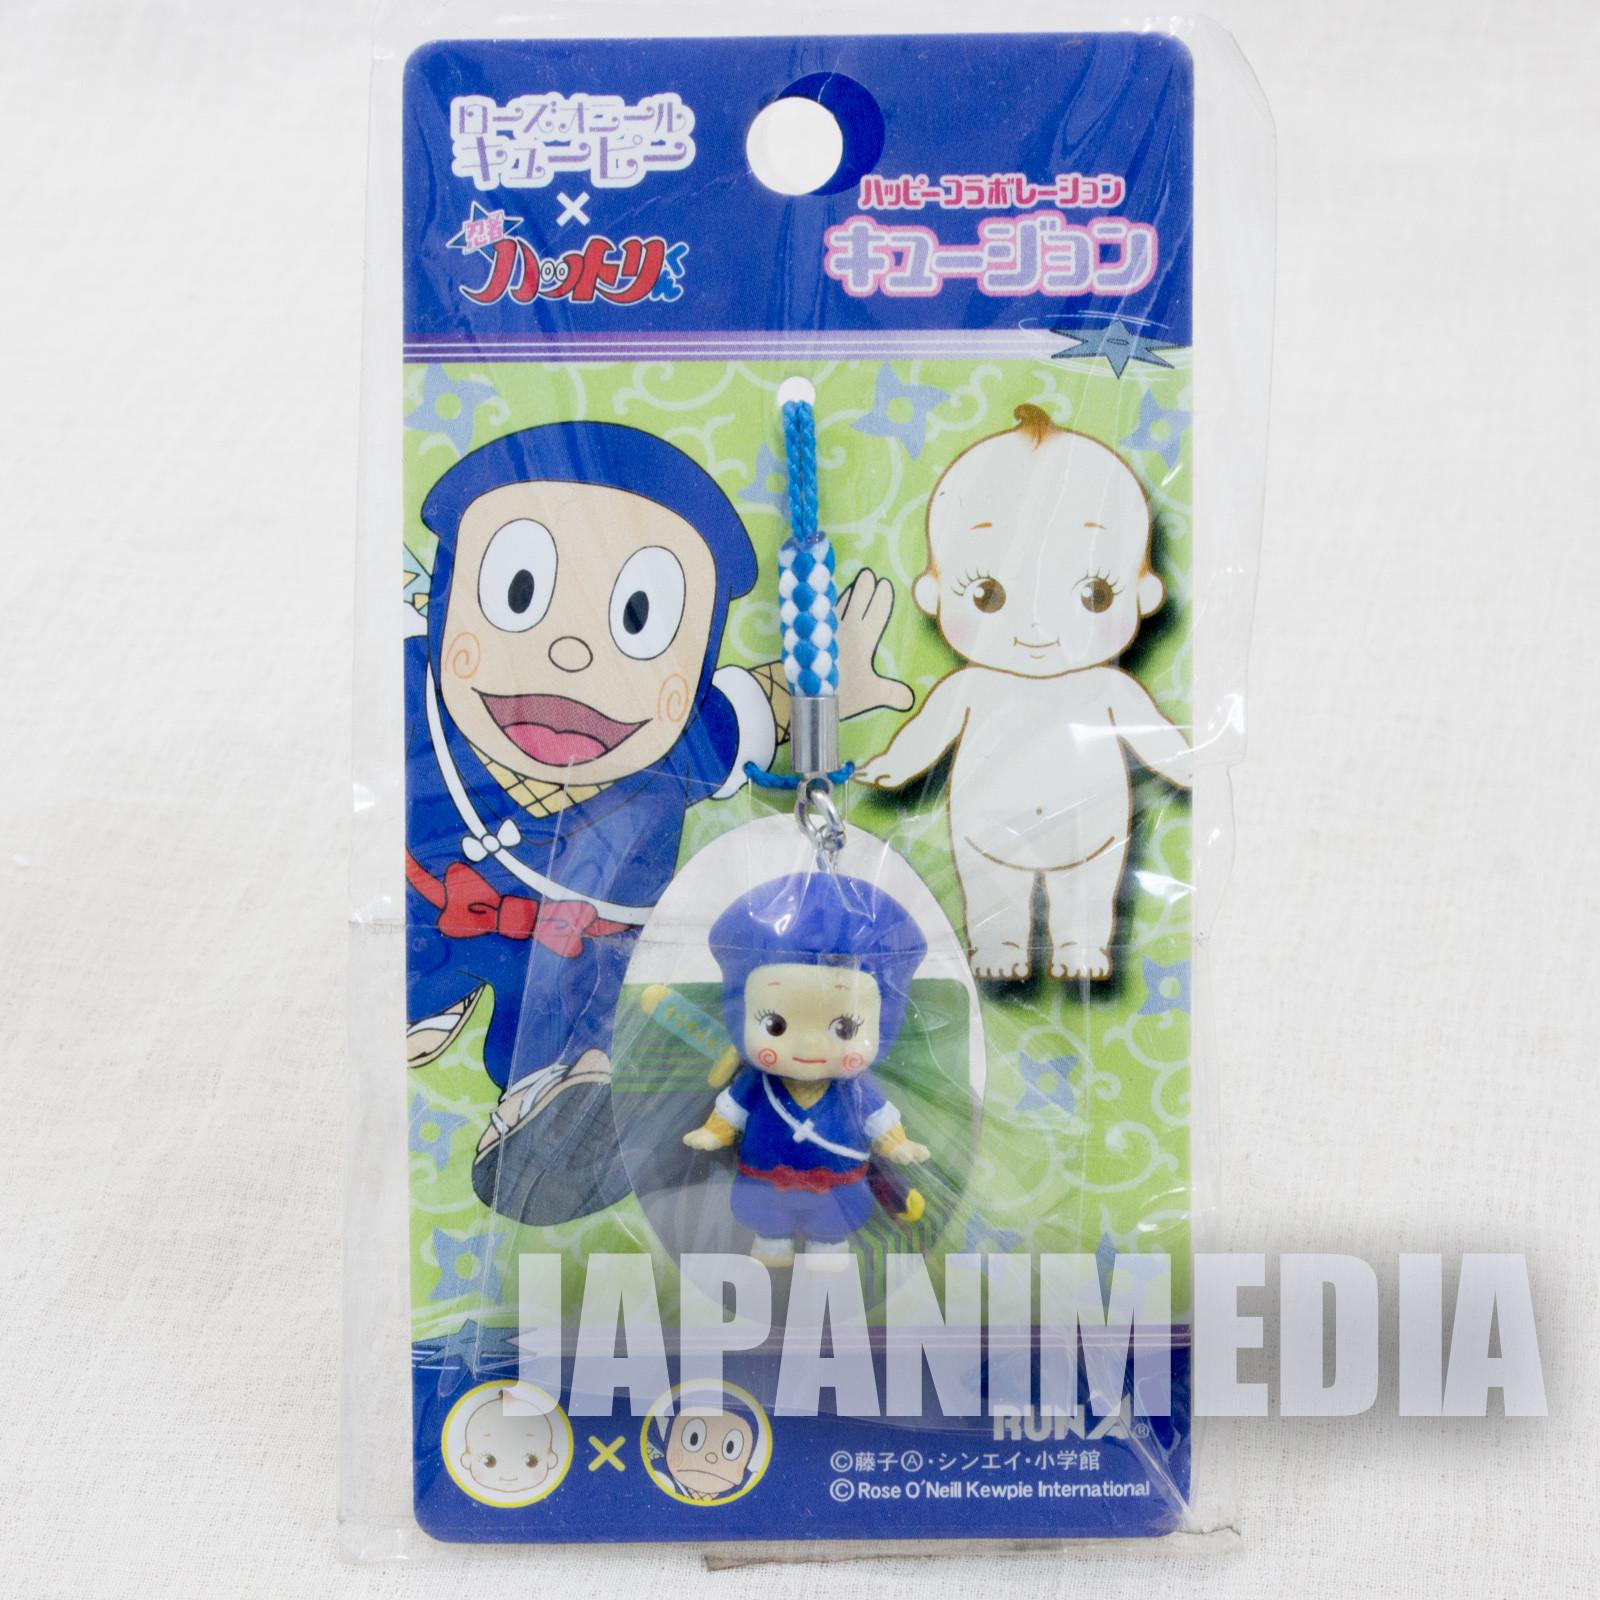 Ninja Hattori Kun Rose O'neill Kewpie Kewsion Figure Strap JAPAN ANIME